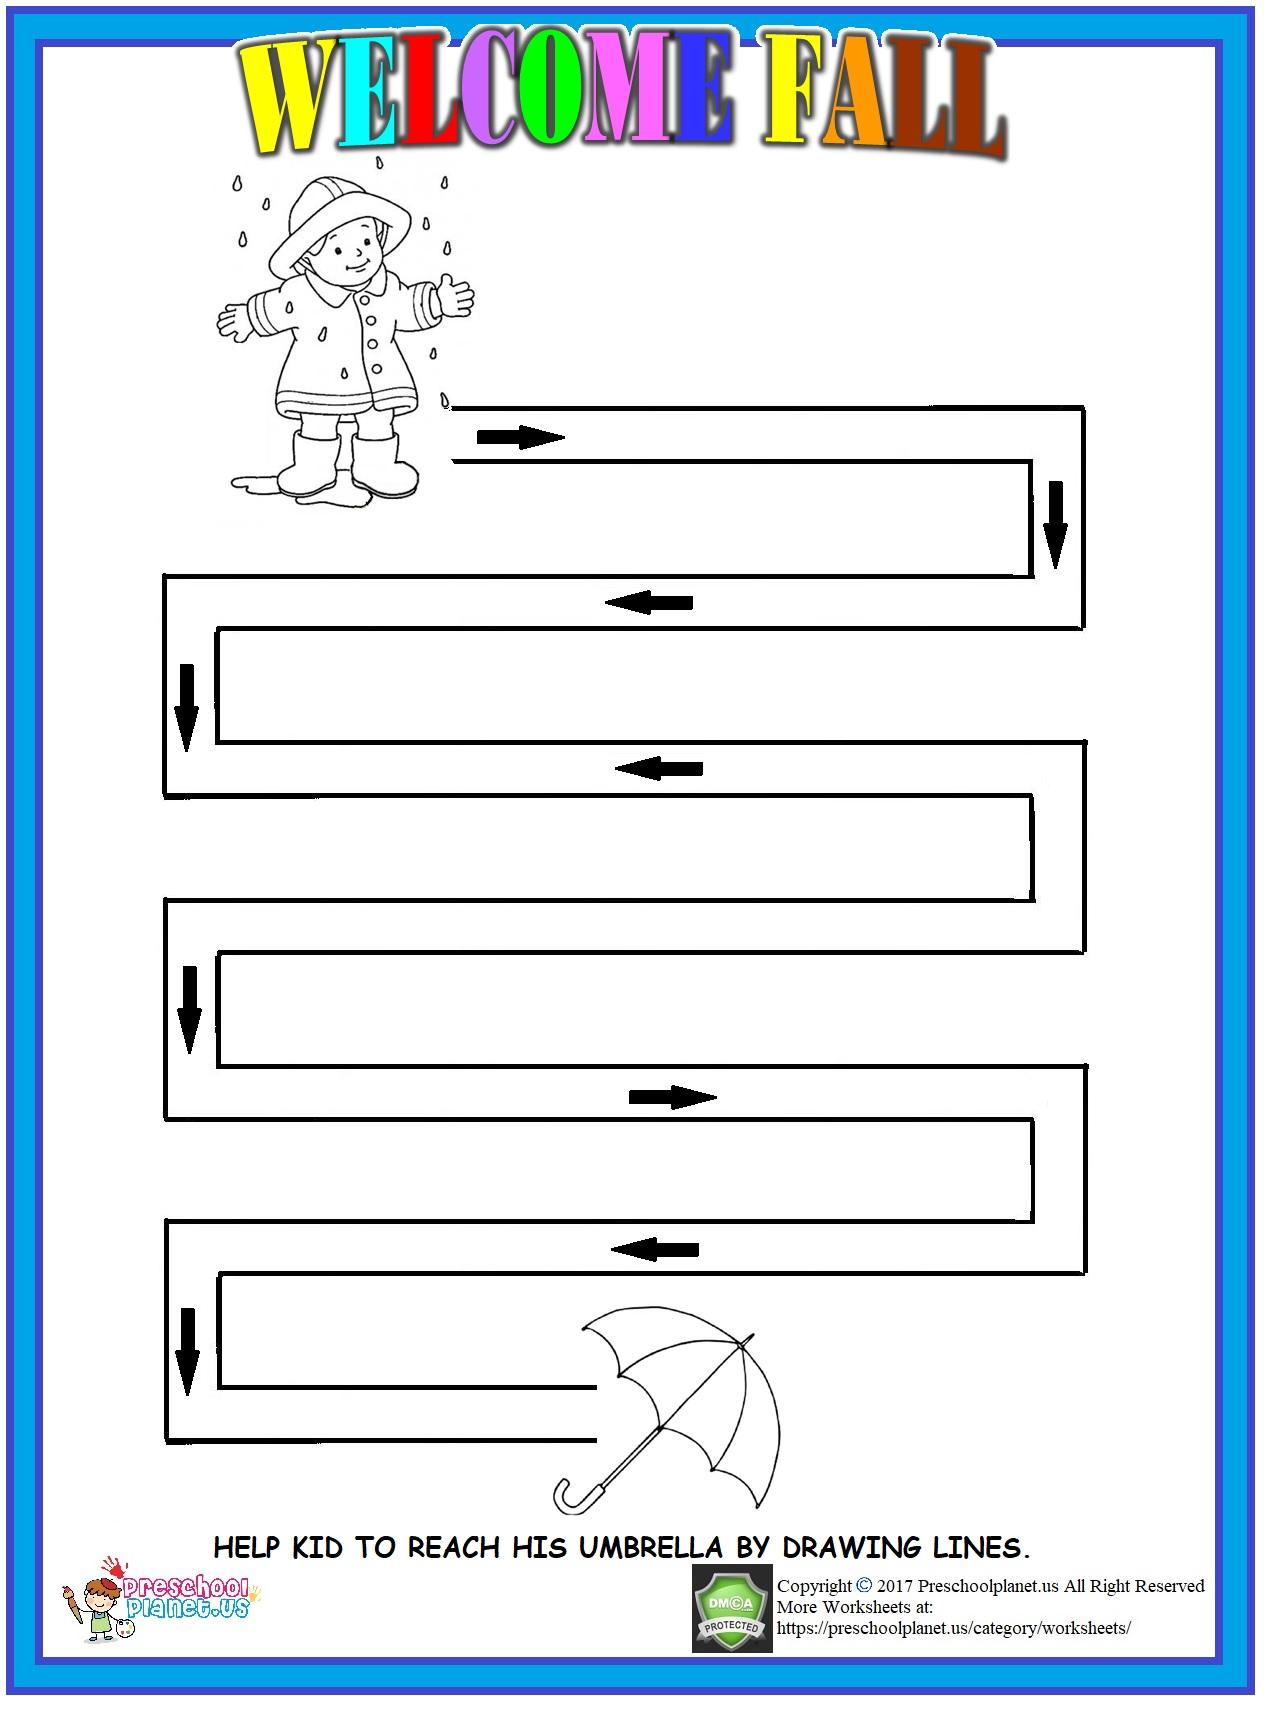 Umbrella Crafts For Kids Preschoolplanet